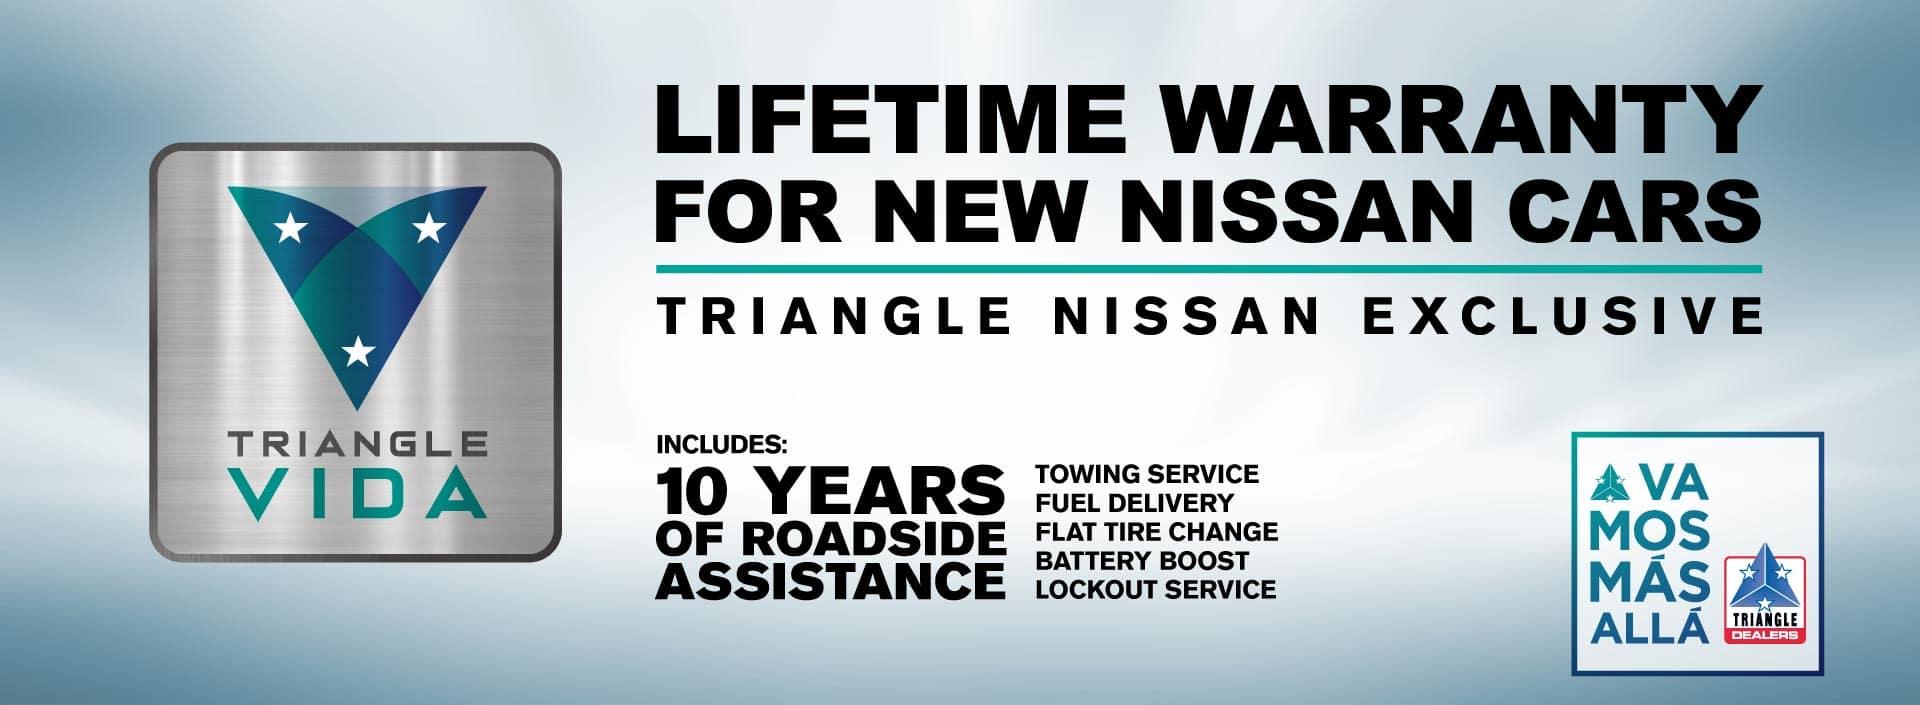 T.Nissan_VIDA_1920x705_Ingles